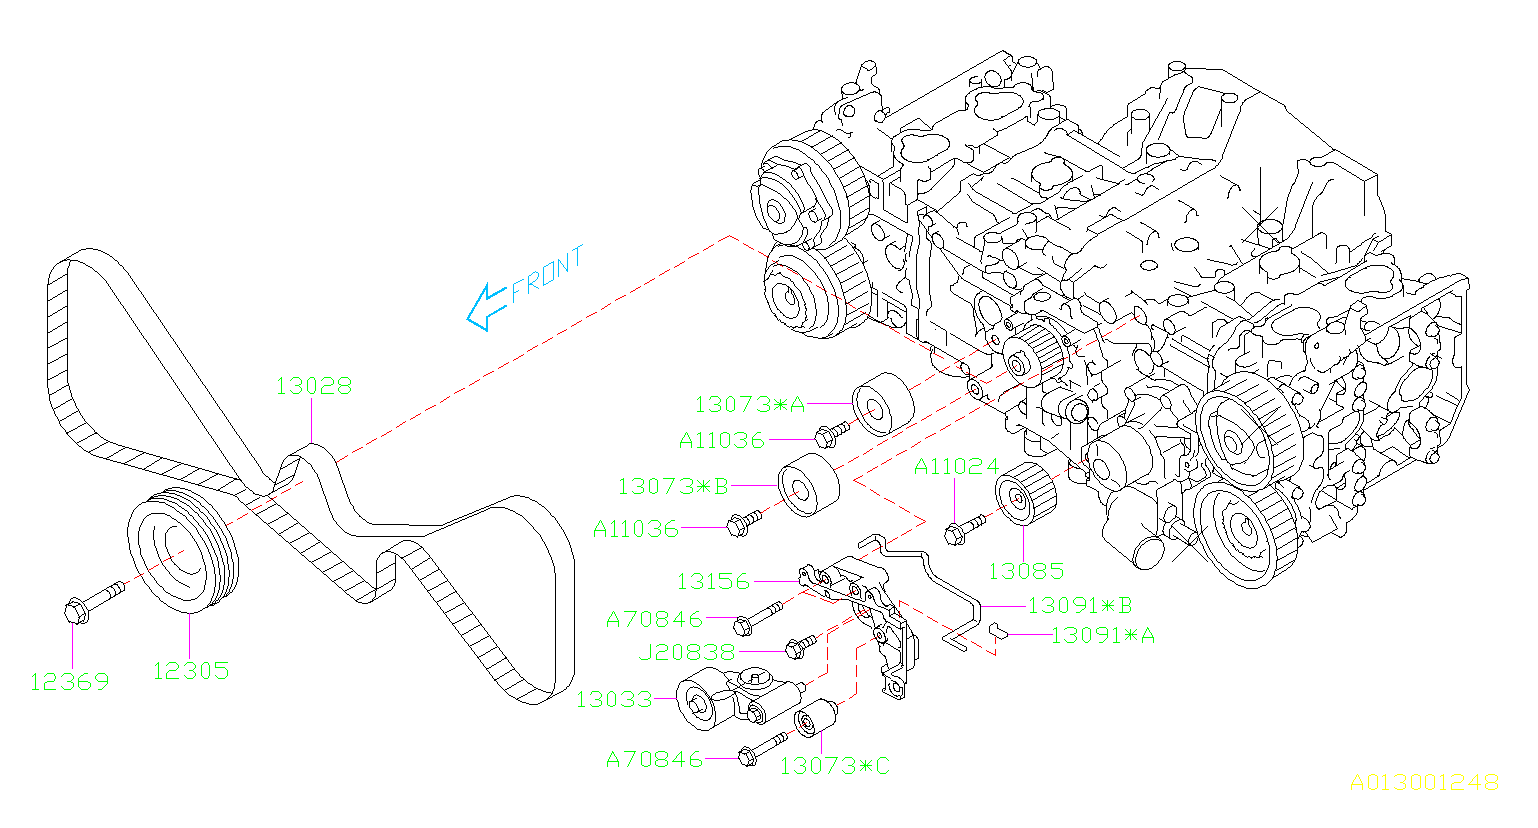 2013 Subaru Forester Engine Crankshaft Pulley